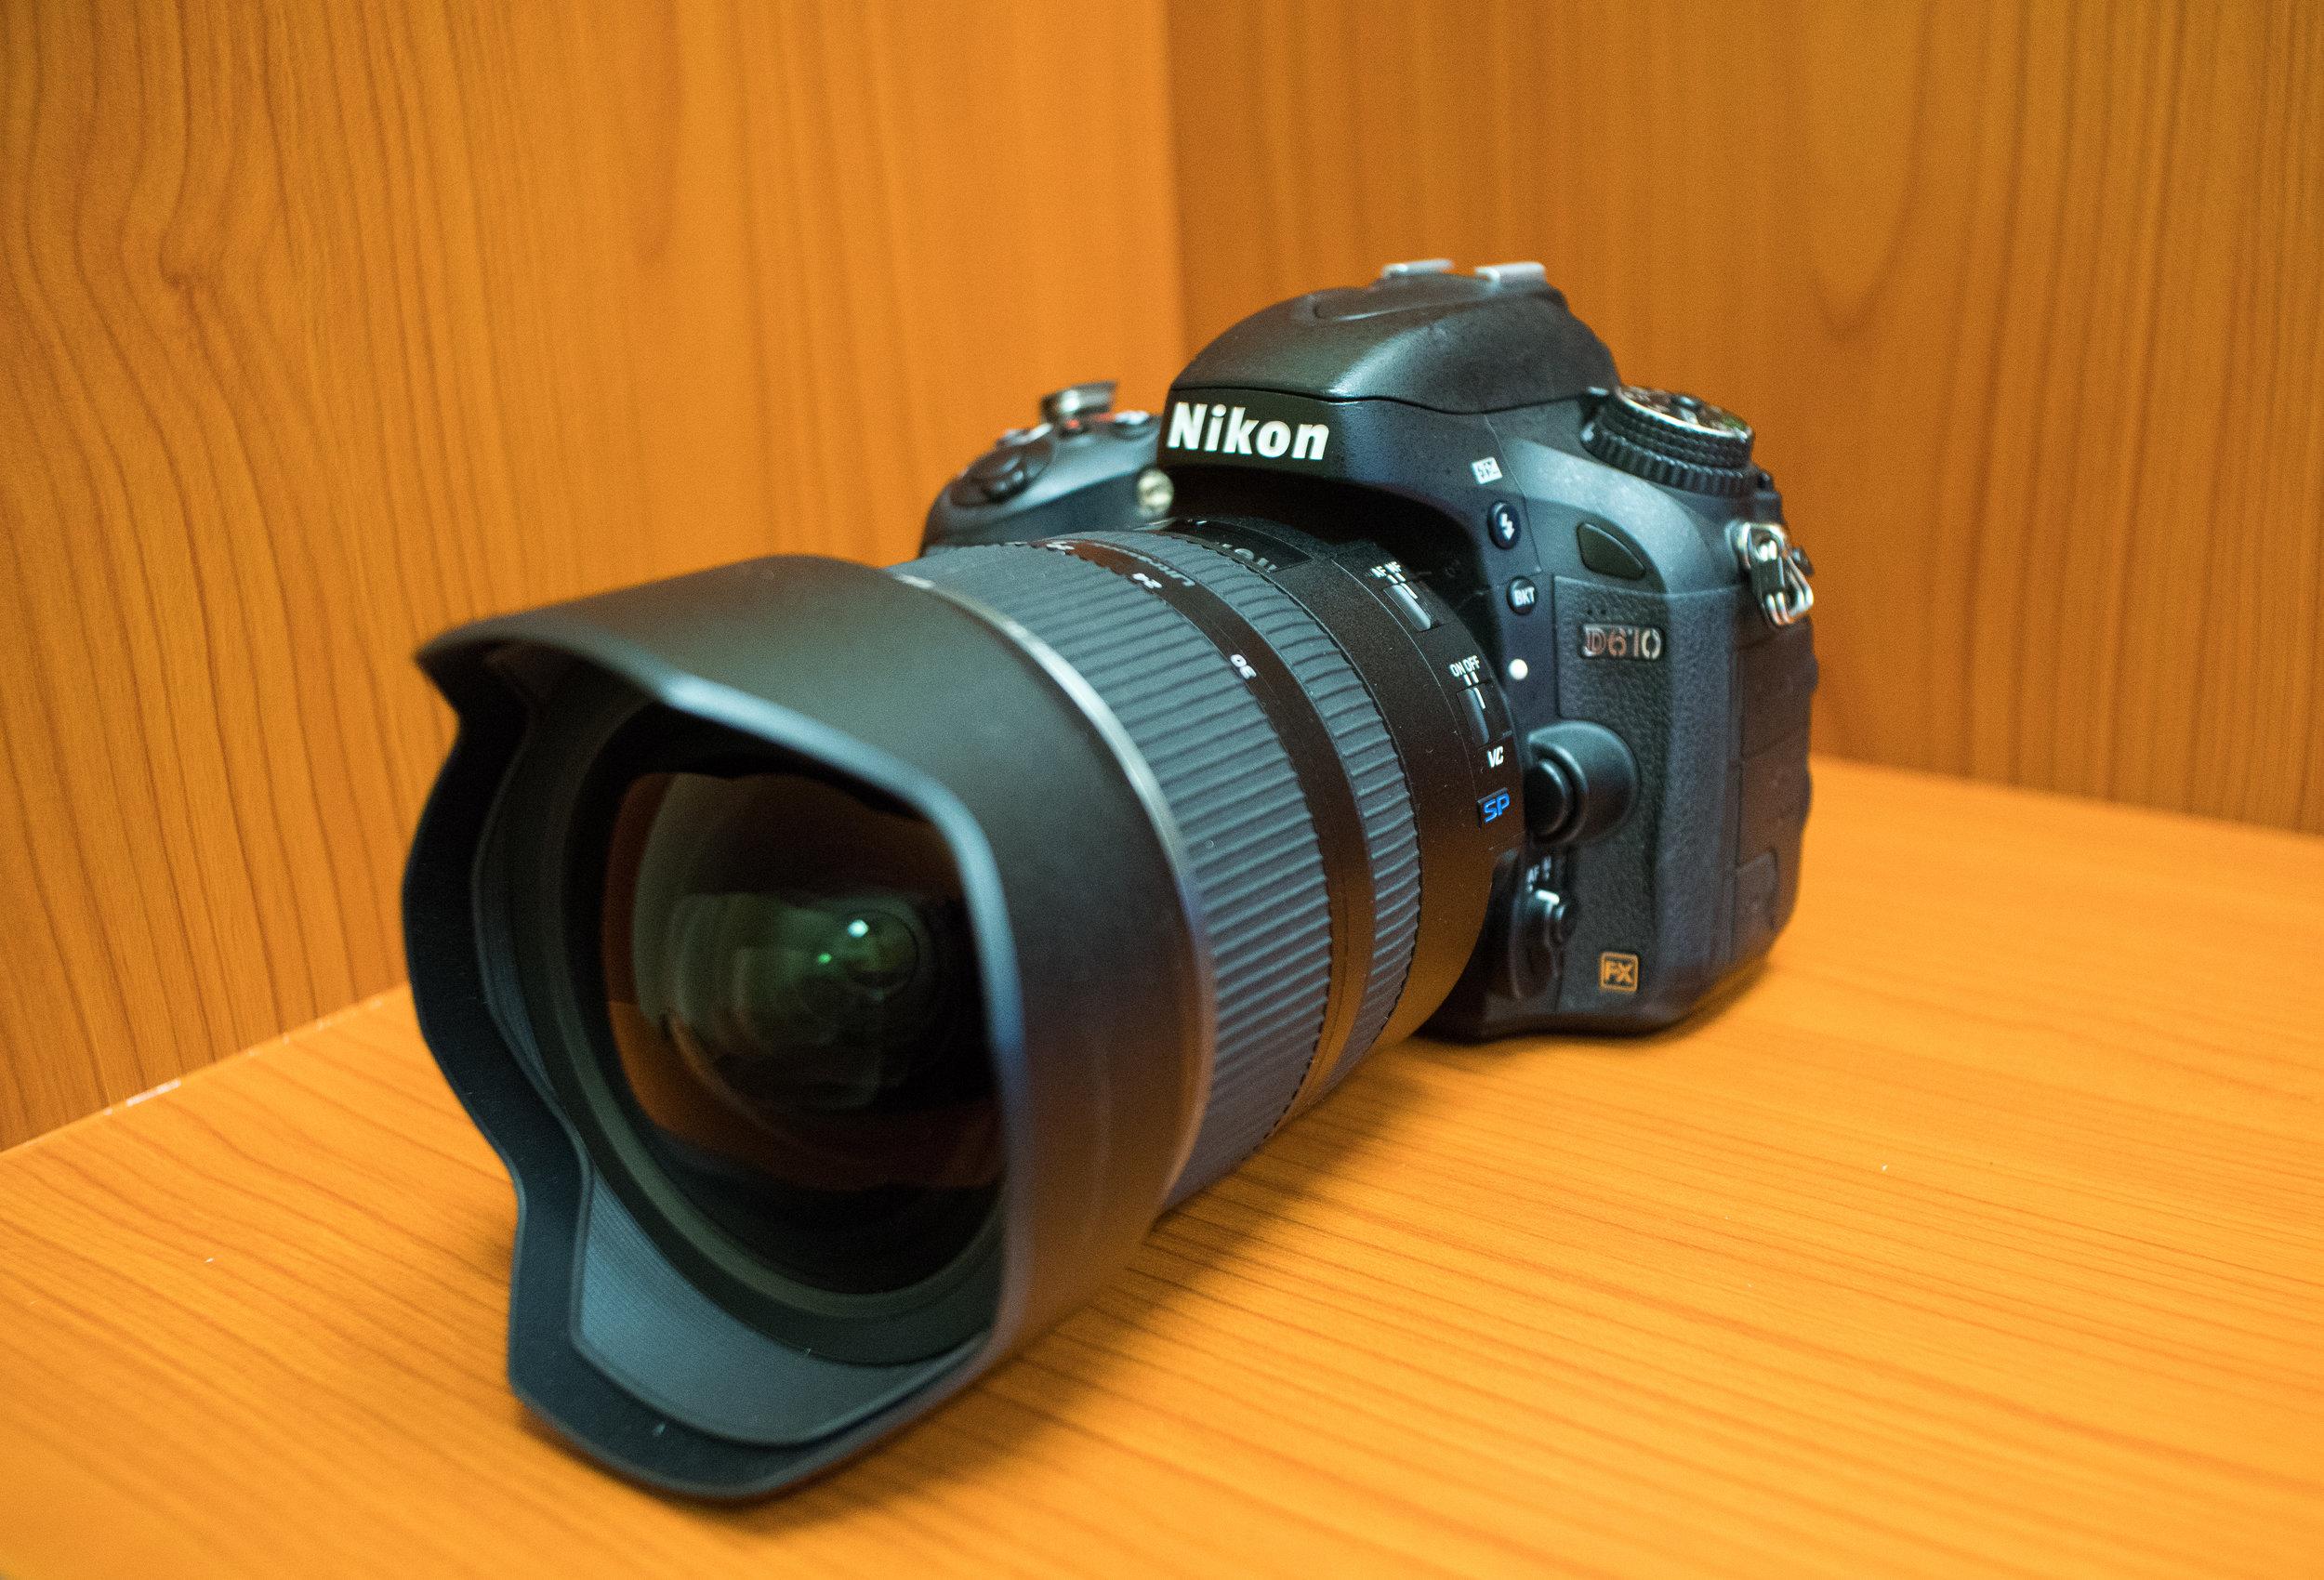 Tamron SP 15-30mm f/2.8 Di VC USD lens mounted on a Nikon D610.